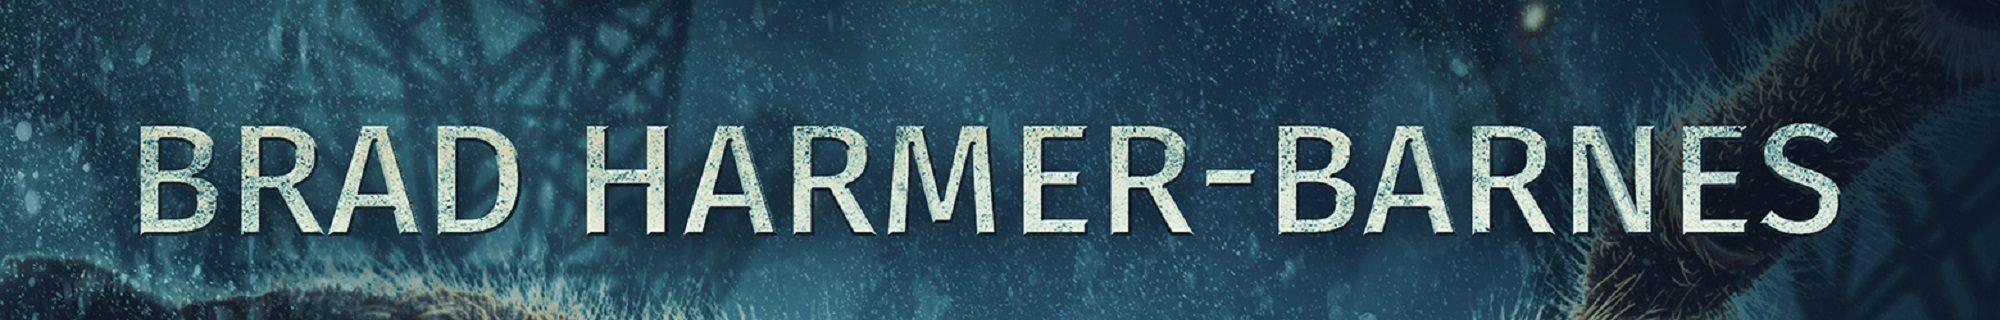 Brad Harmer-Barnes